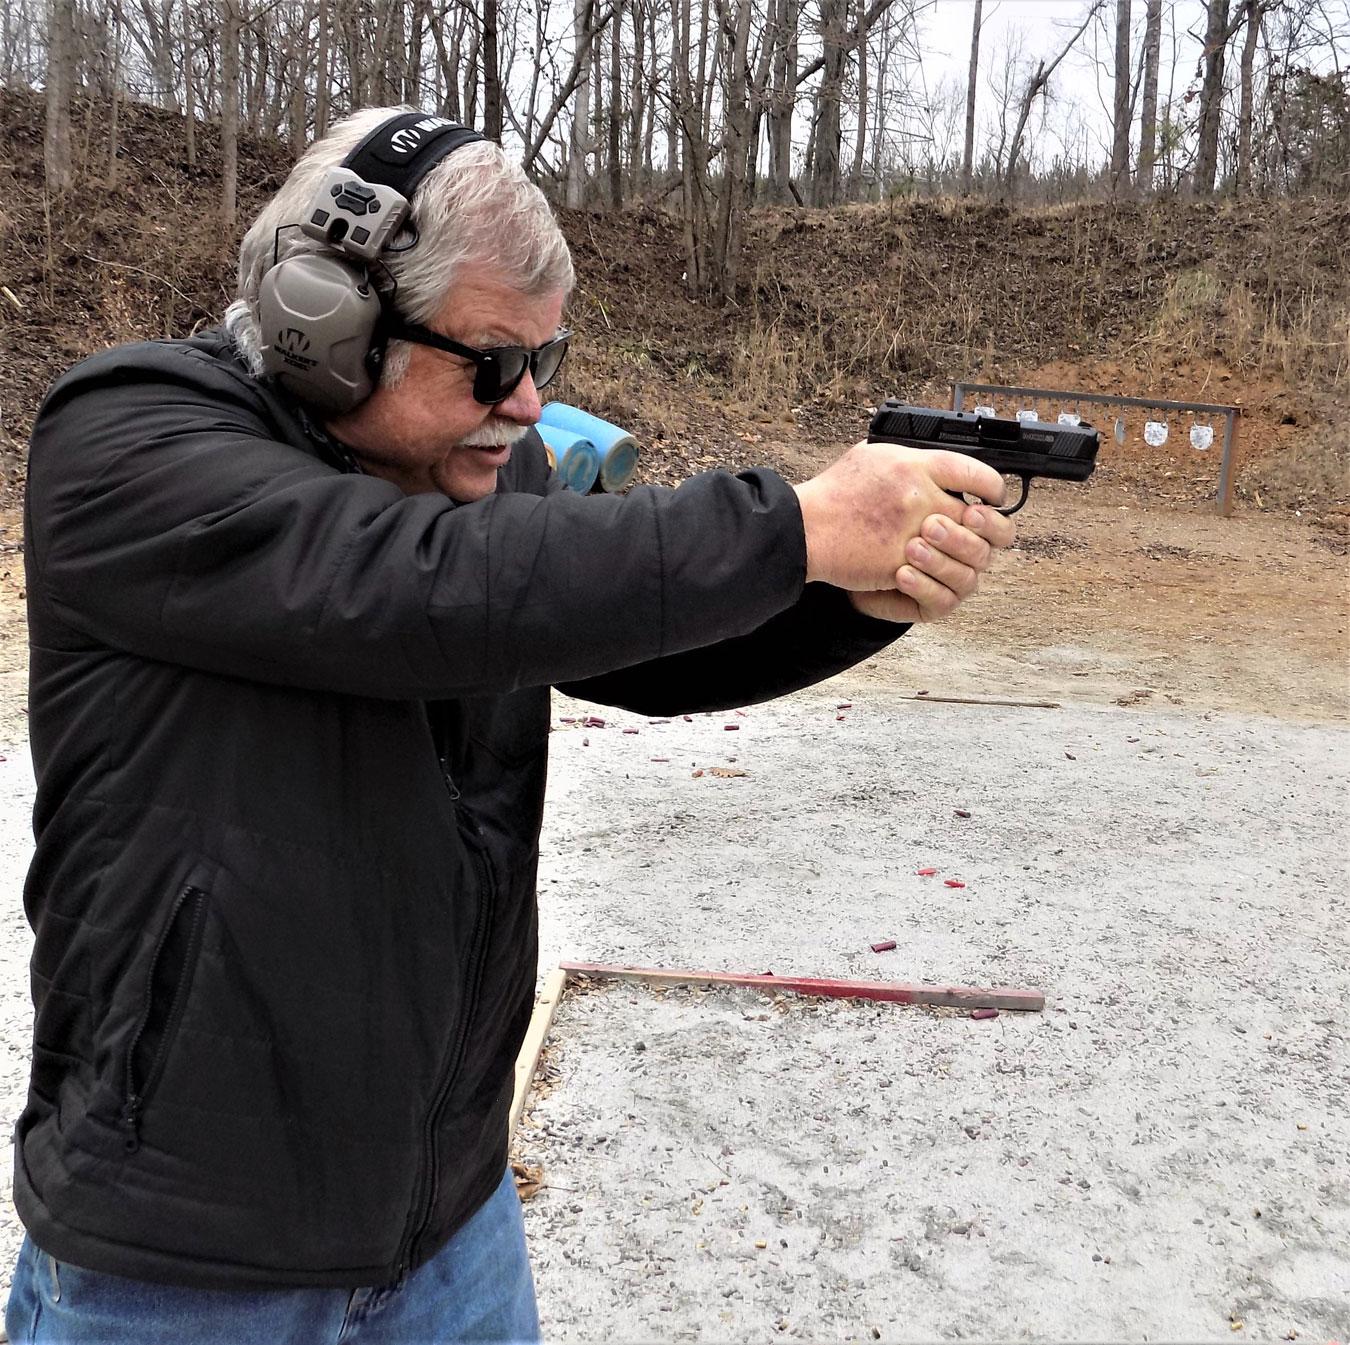 Bob Campbell shooting the Mossberg MC1 pistol